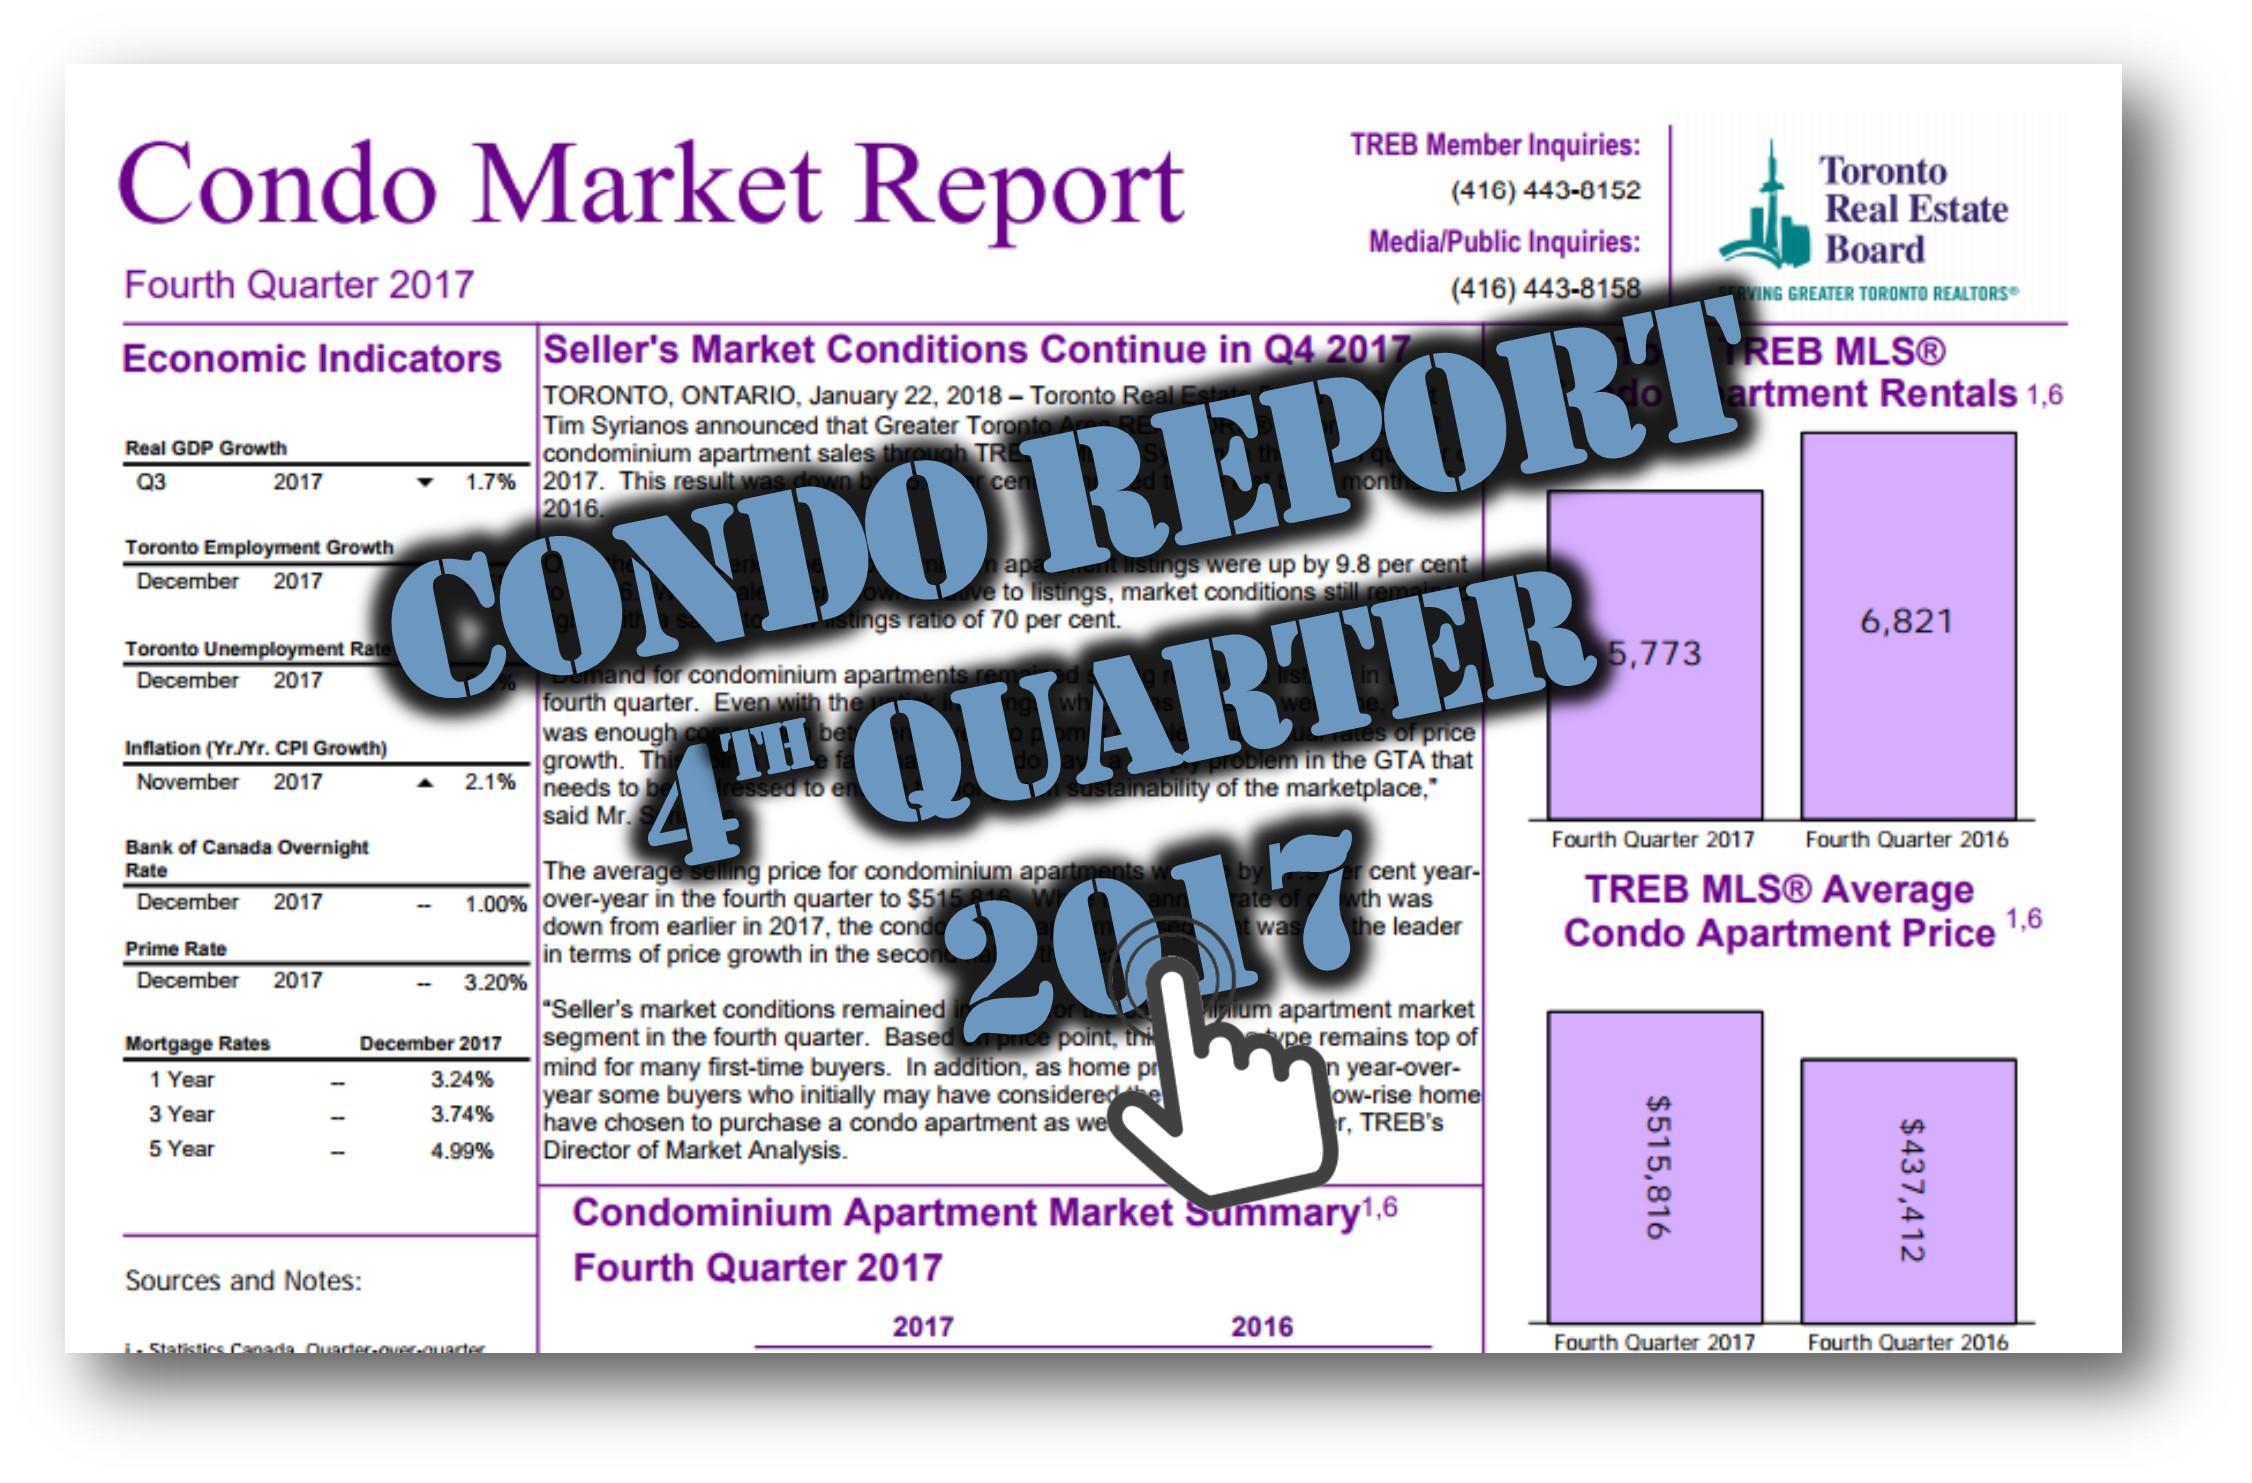 TREB CONDO REPORT Q4.17.jpg